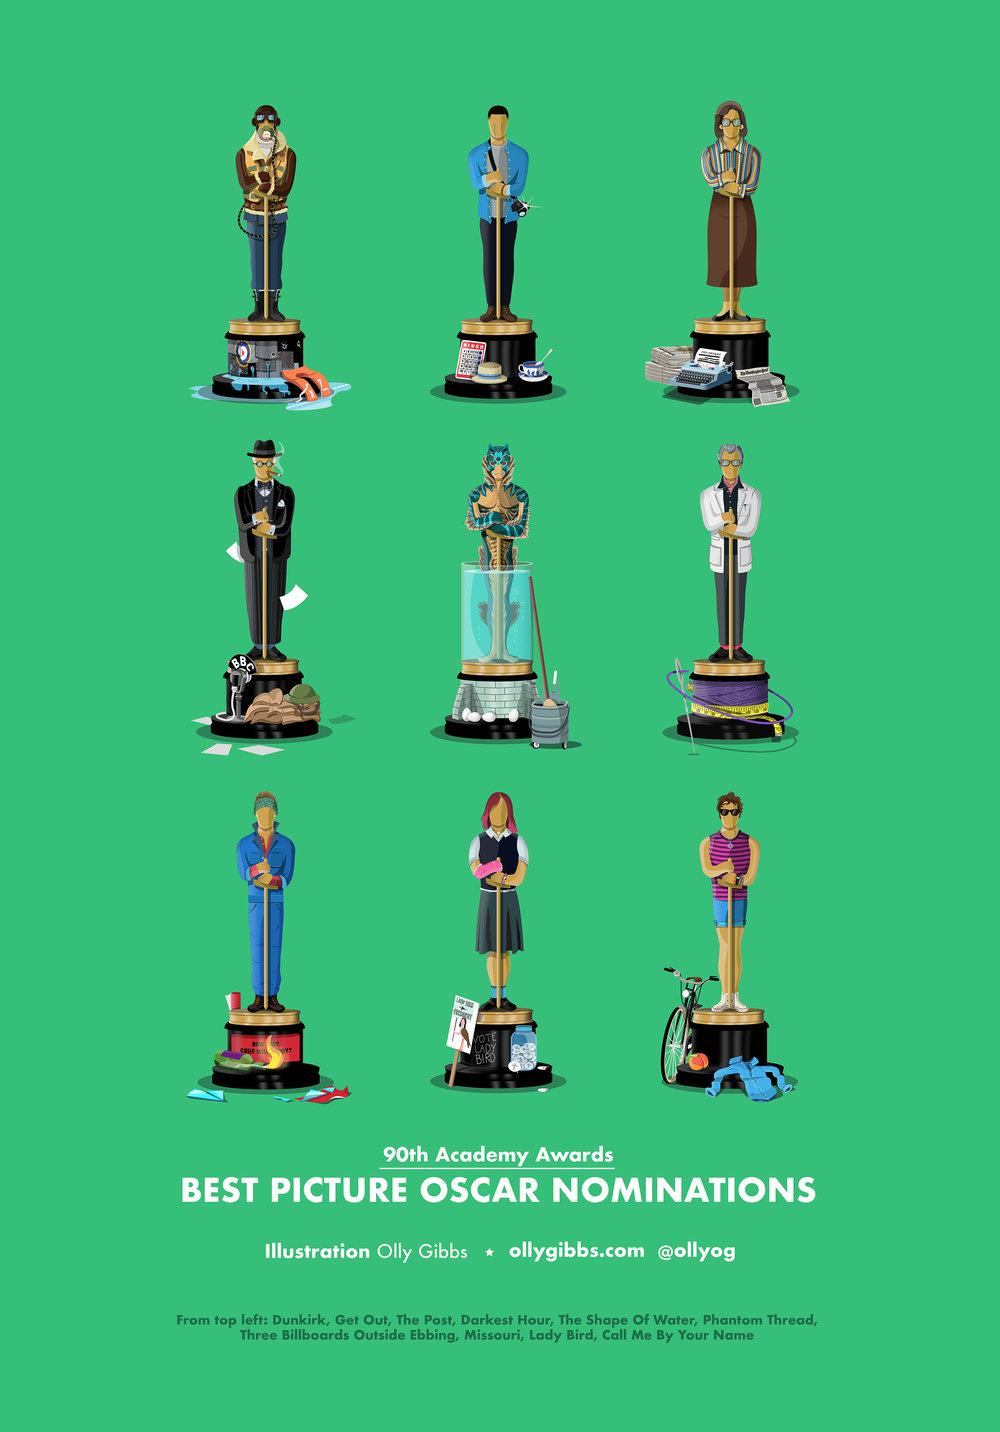 Oscars2018-BestPicture-OllyGibbs.jpg